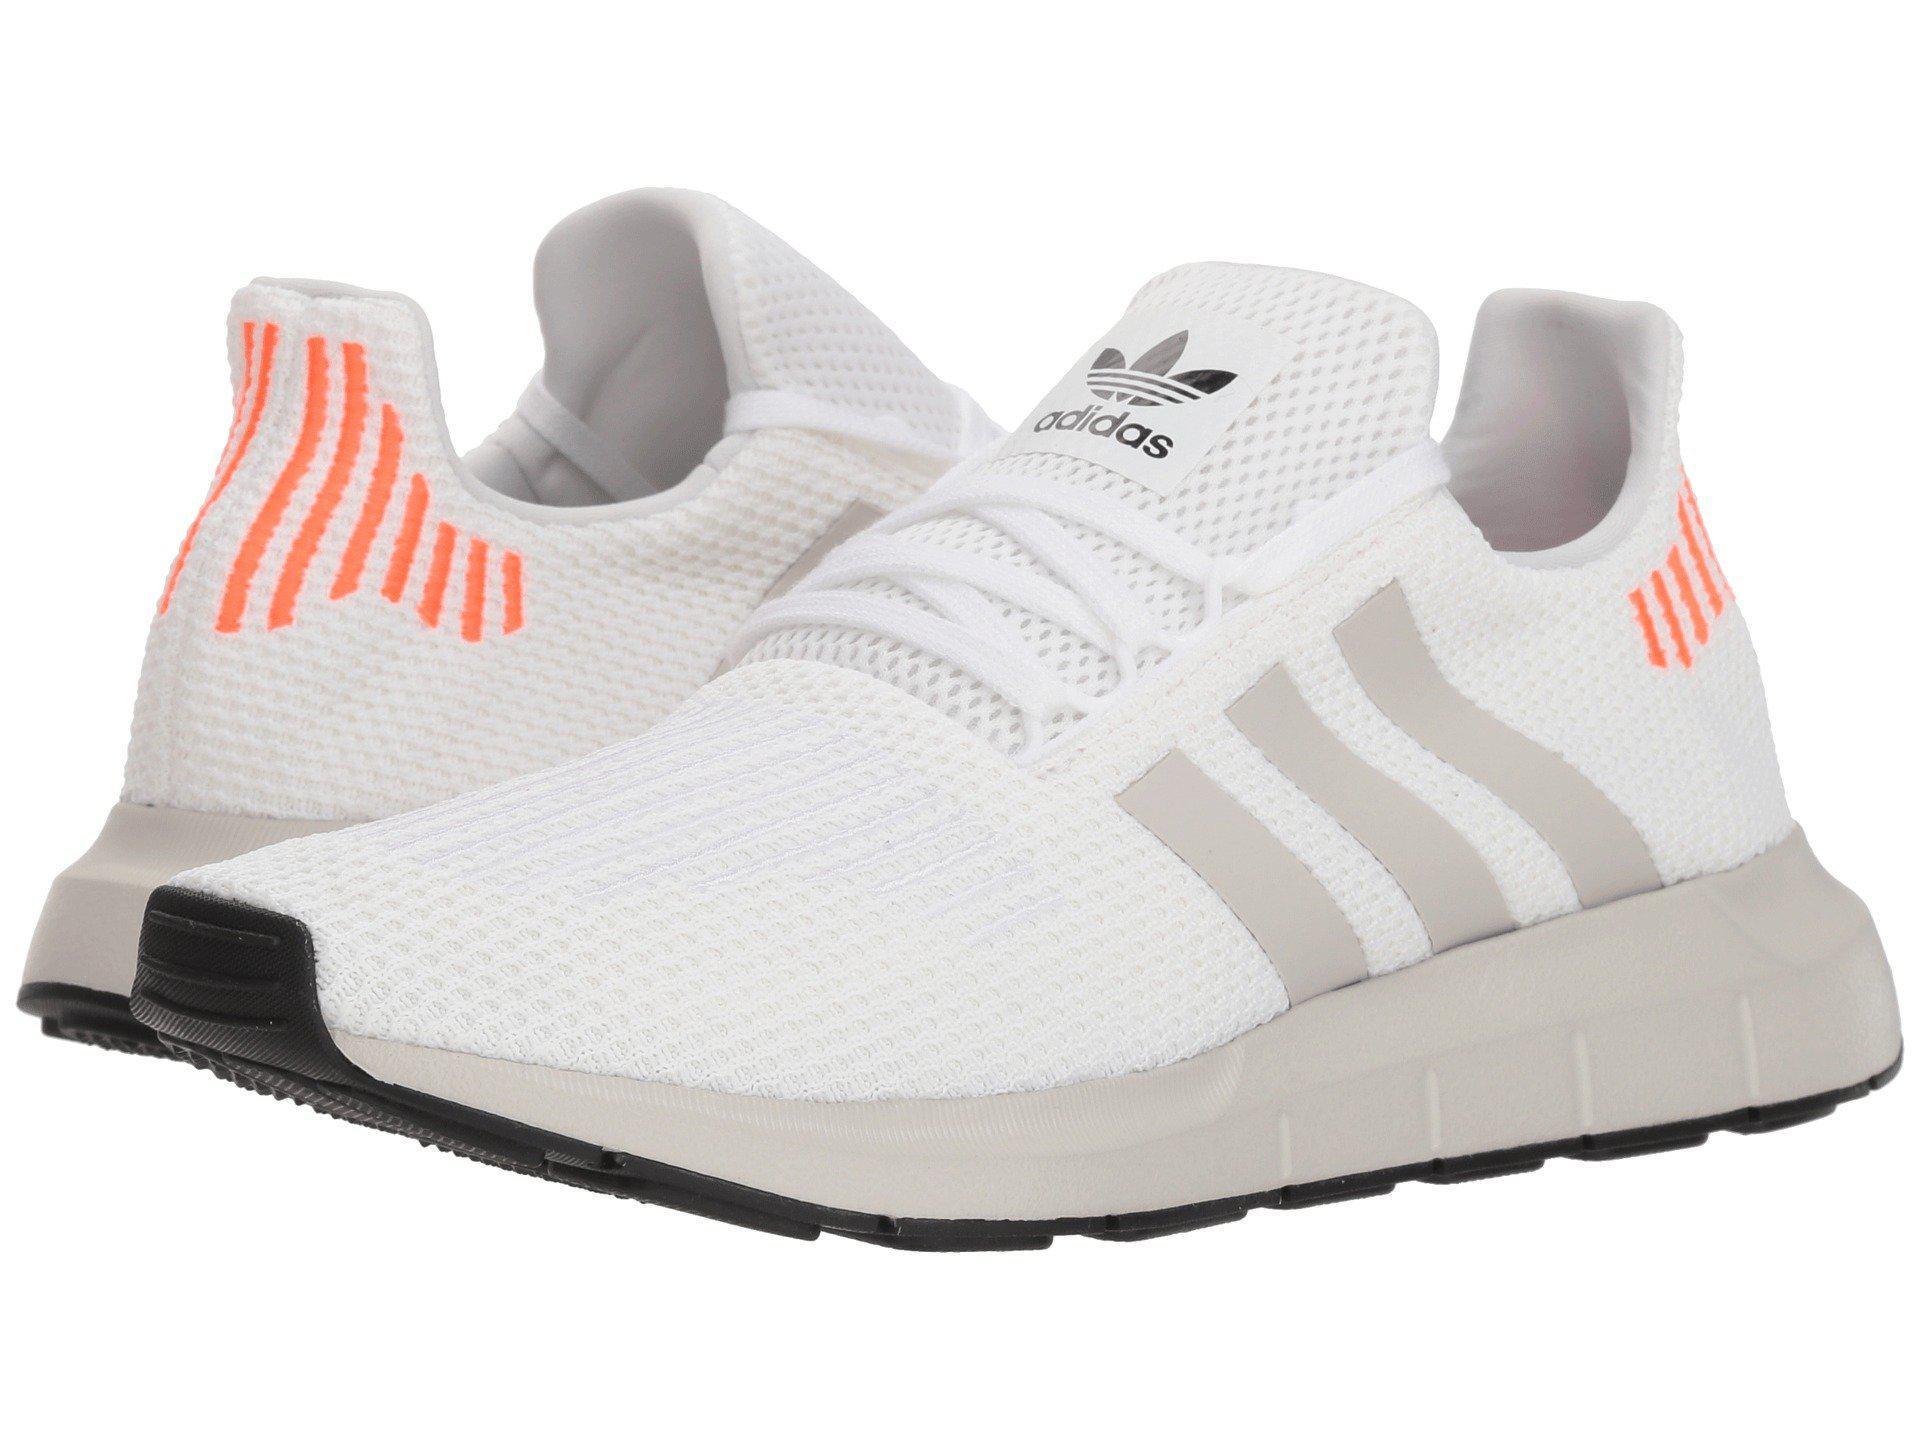 hot sale online 0bf3d 5b7f5 adidas Originals. Mens Swift Run